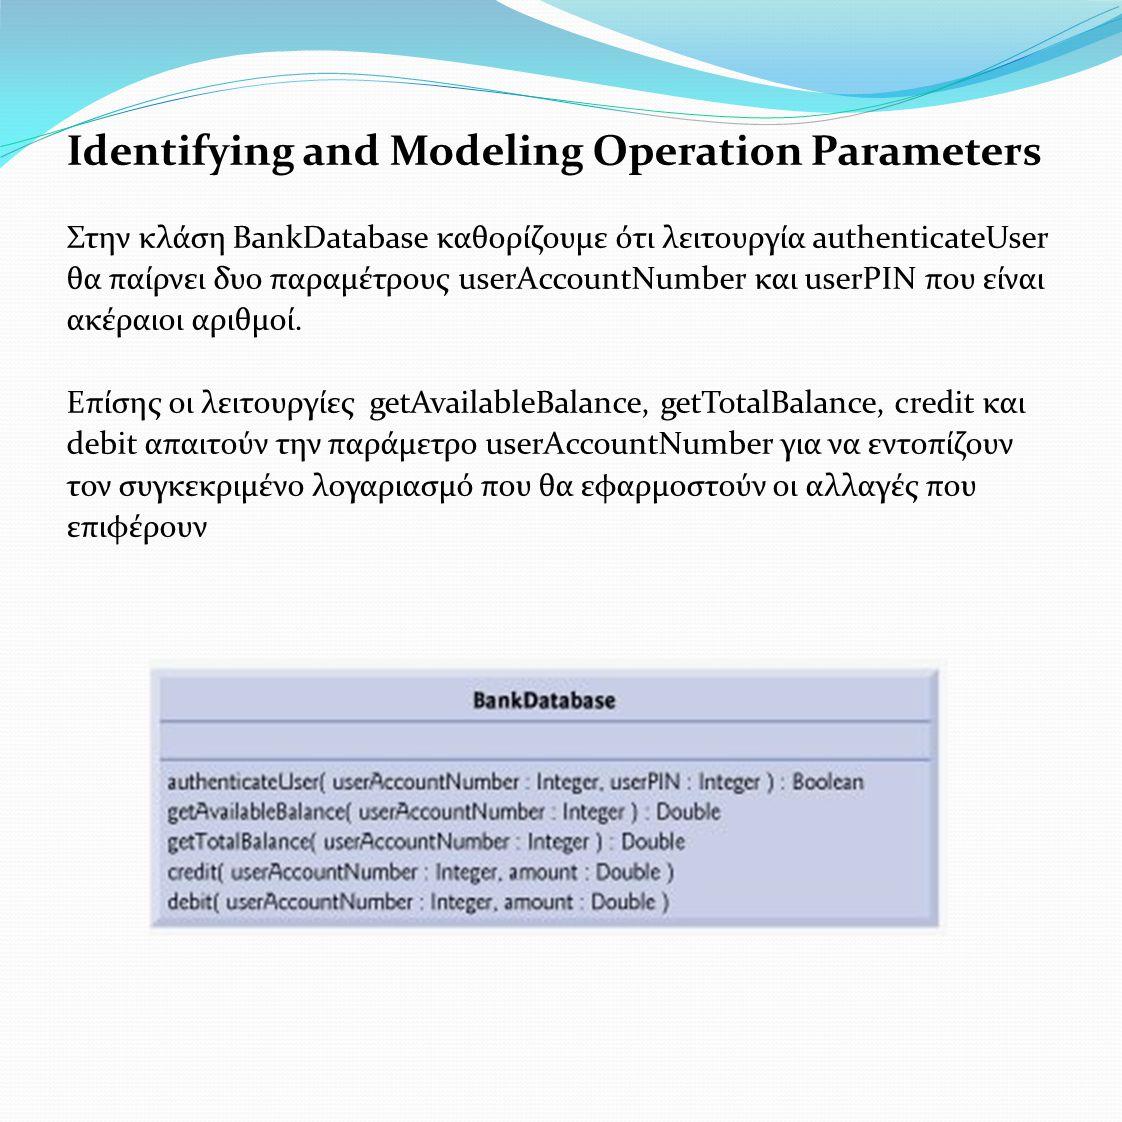 Identifying and Modeling Operation Parameters Στην κλάση BankDatabase καθορίζουμε ότι λειτουργία authenticateUser θα παίρνει δυο παραμέτρους userAccountNumber και userPΙΝ που είναι ακέραιοι αριθμοί.